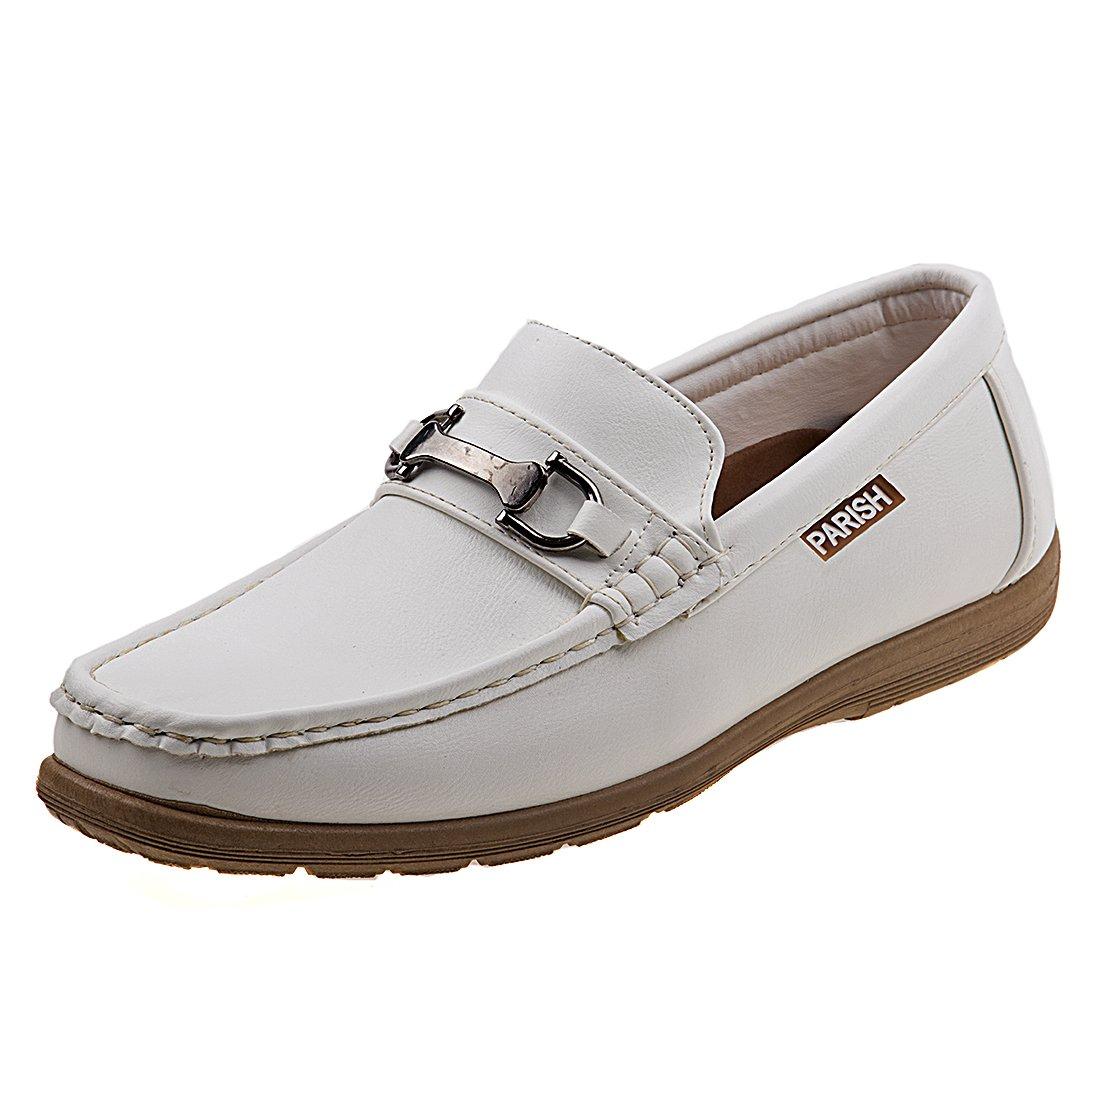 PARISH NATION Mens Slip On Sport Dress Shoe, White, Size 12 D(M) US'